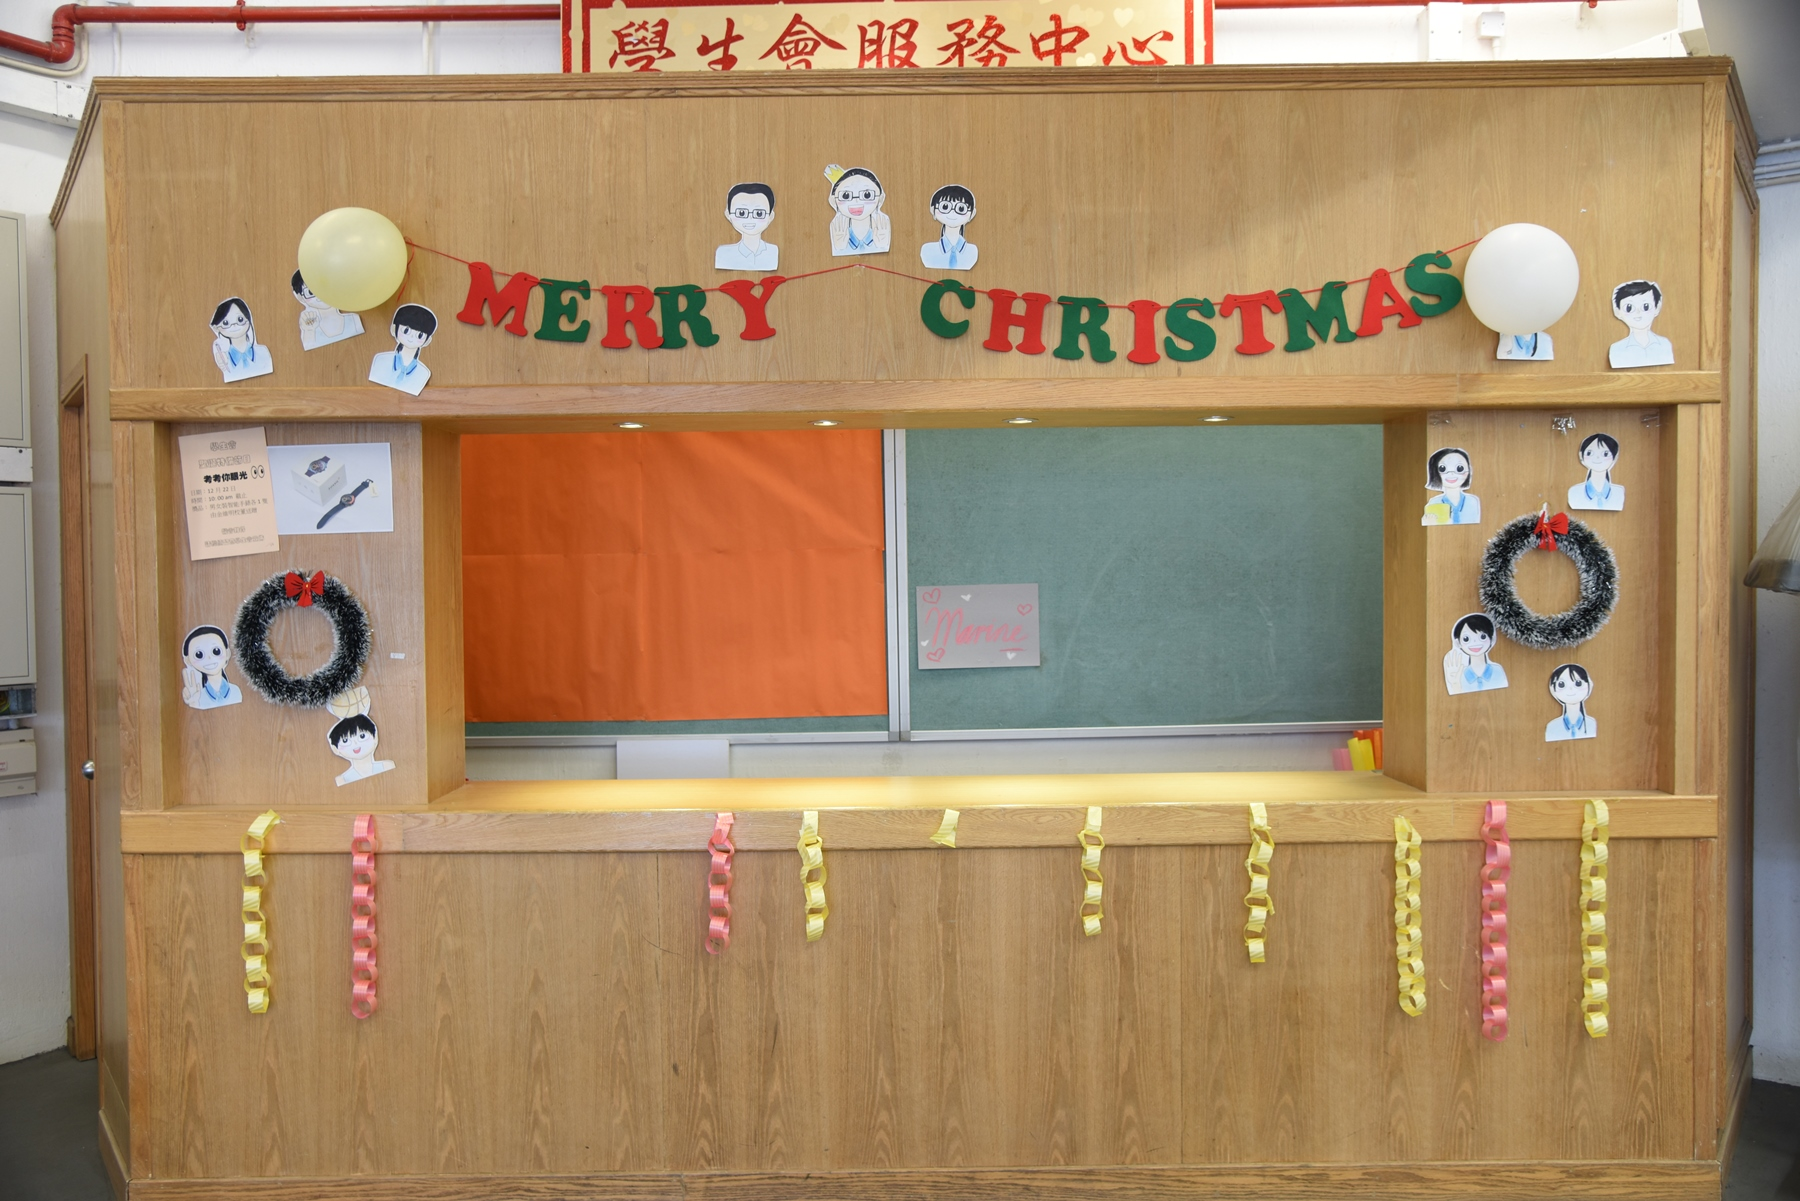 http://www.npc.edu.hk/sites/default/files/dsc_6106.jpg